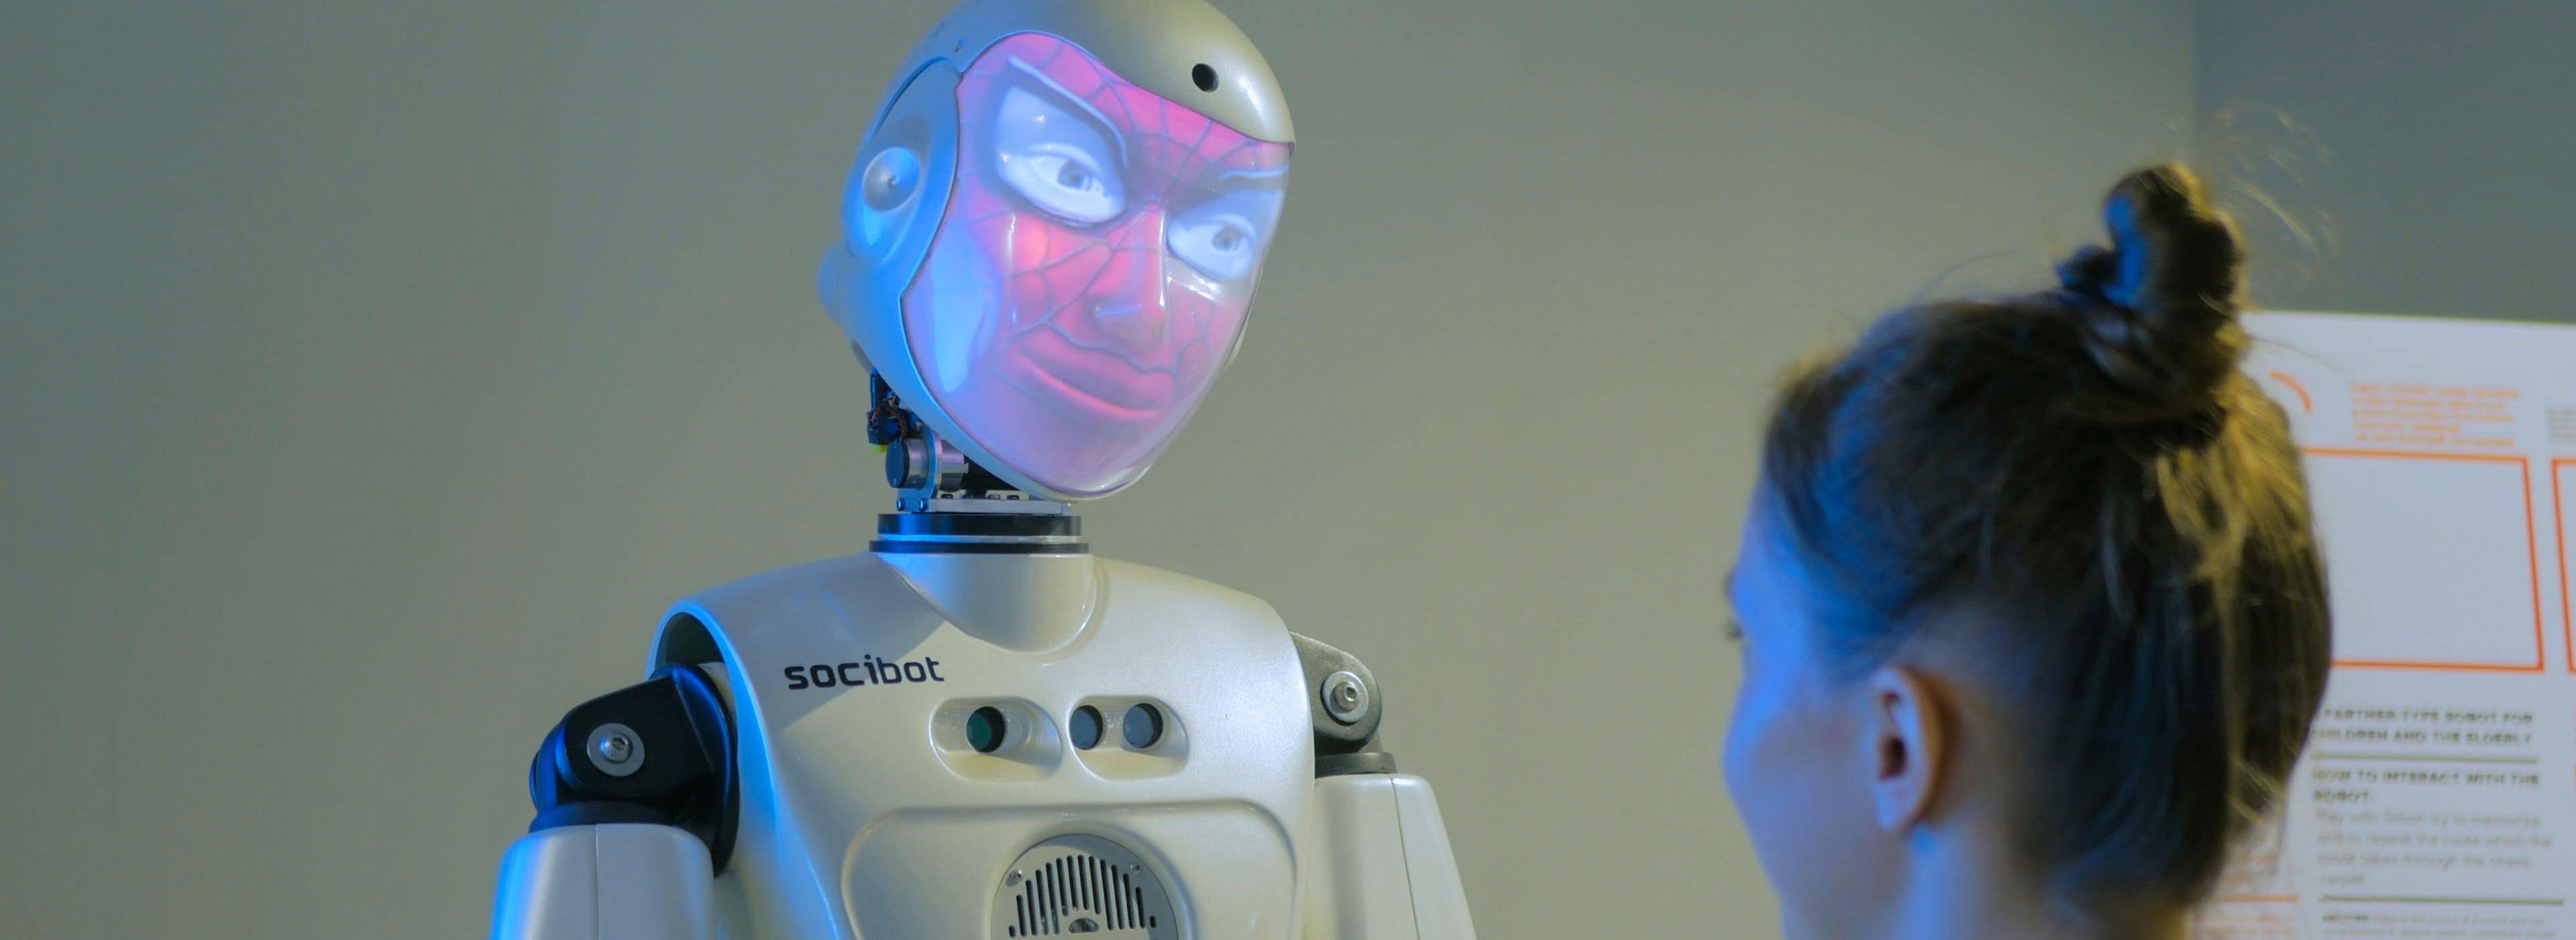 artificial-intelligence-future-humanoid-robot_0.jpg